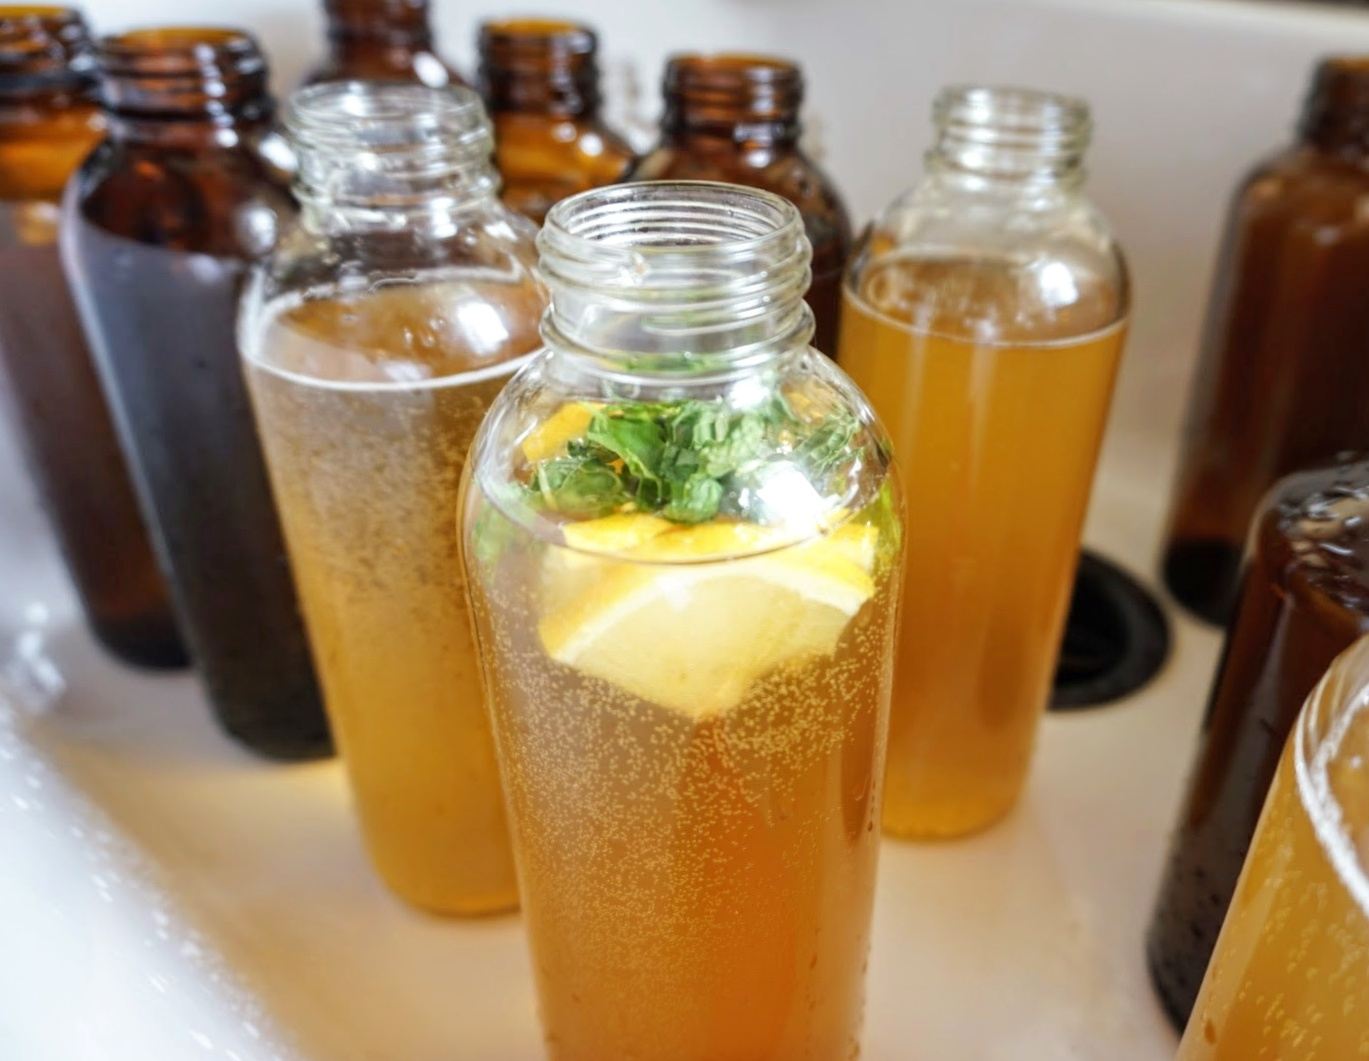 Tiny Home Kombucha Brewing Scoby bottling homemade organic flavors fruit